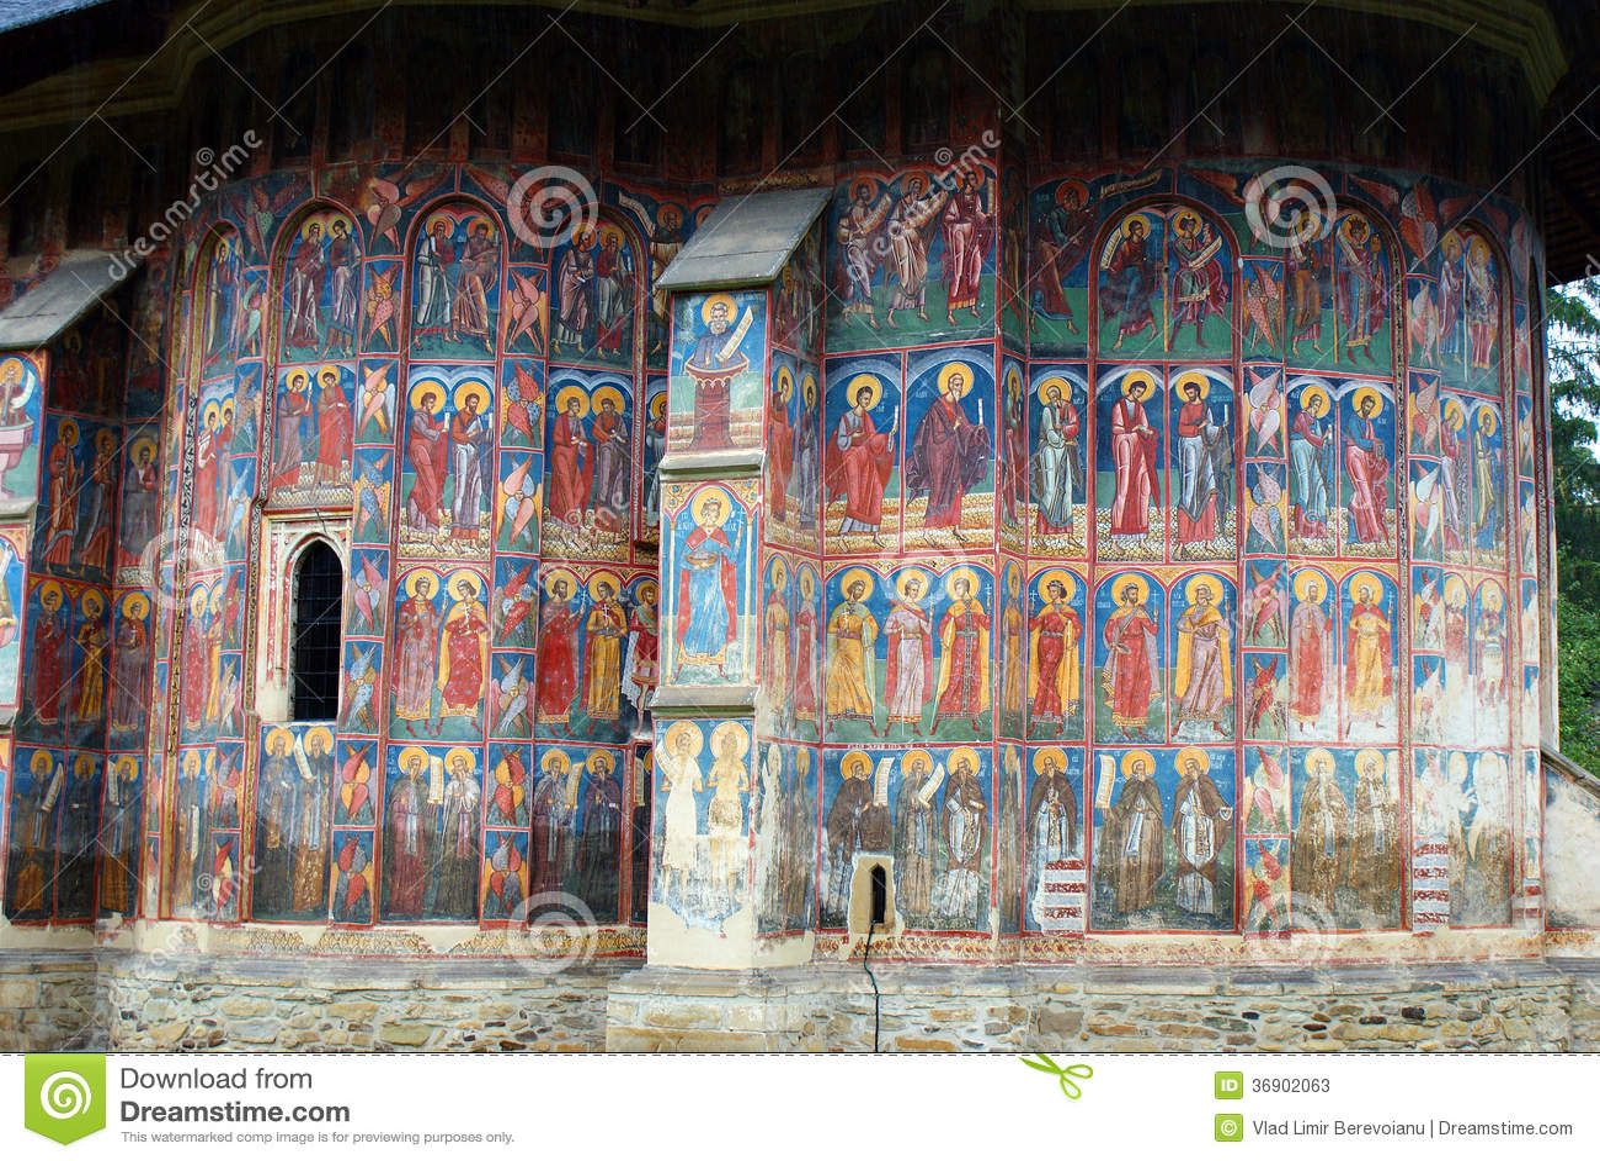 Voyage vers la roumanie peintures murales de moldovita for Peintures murales